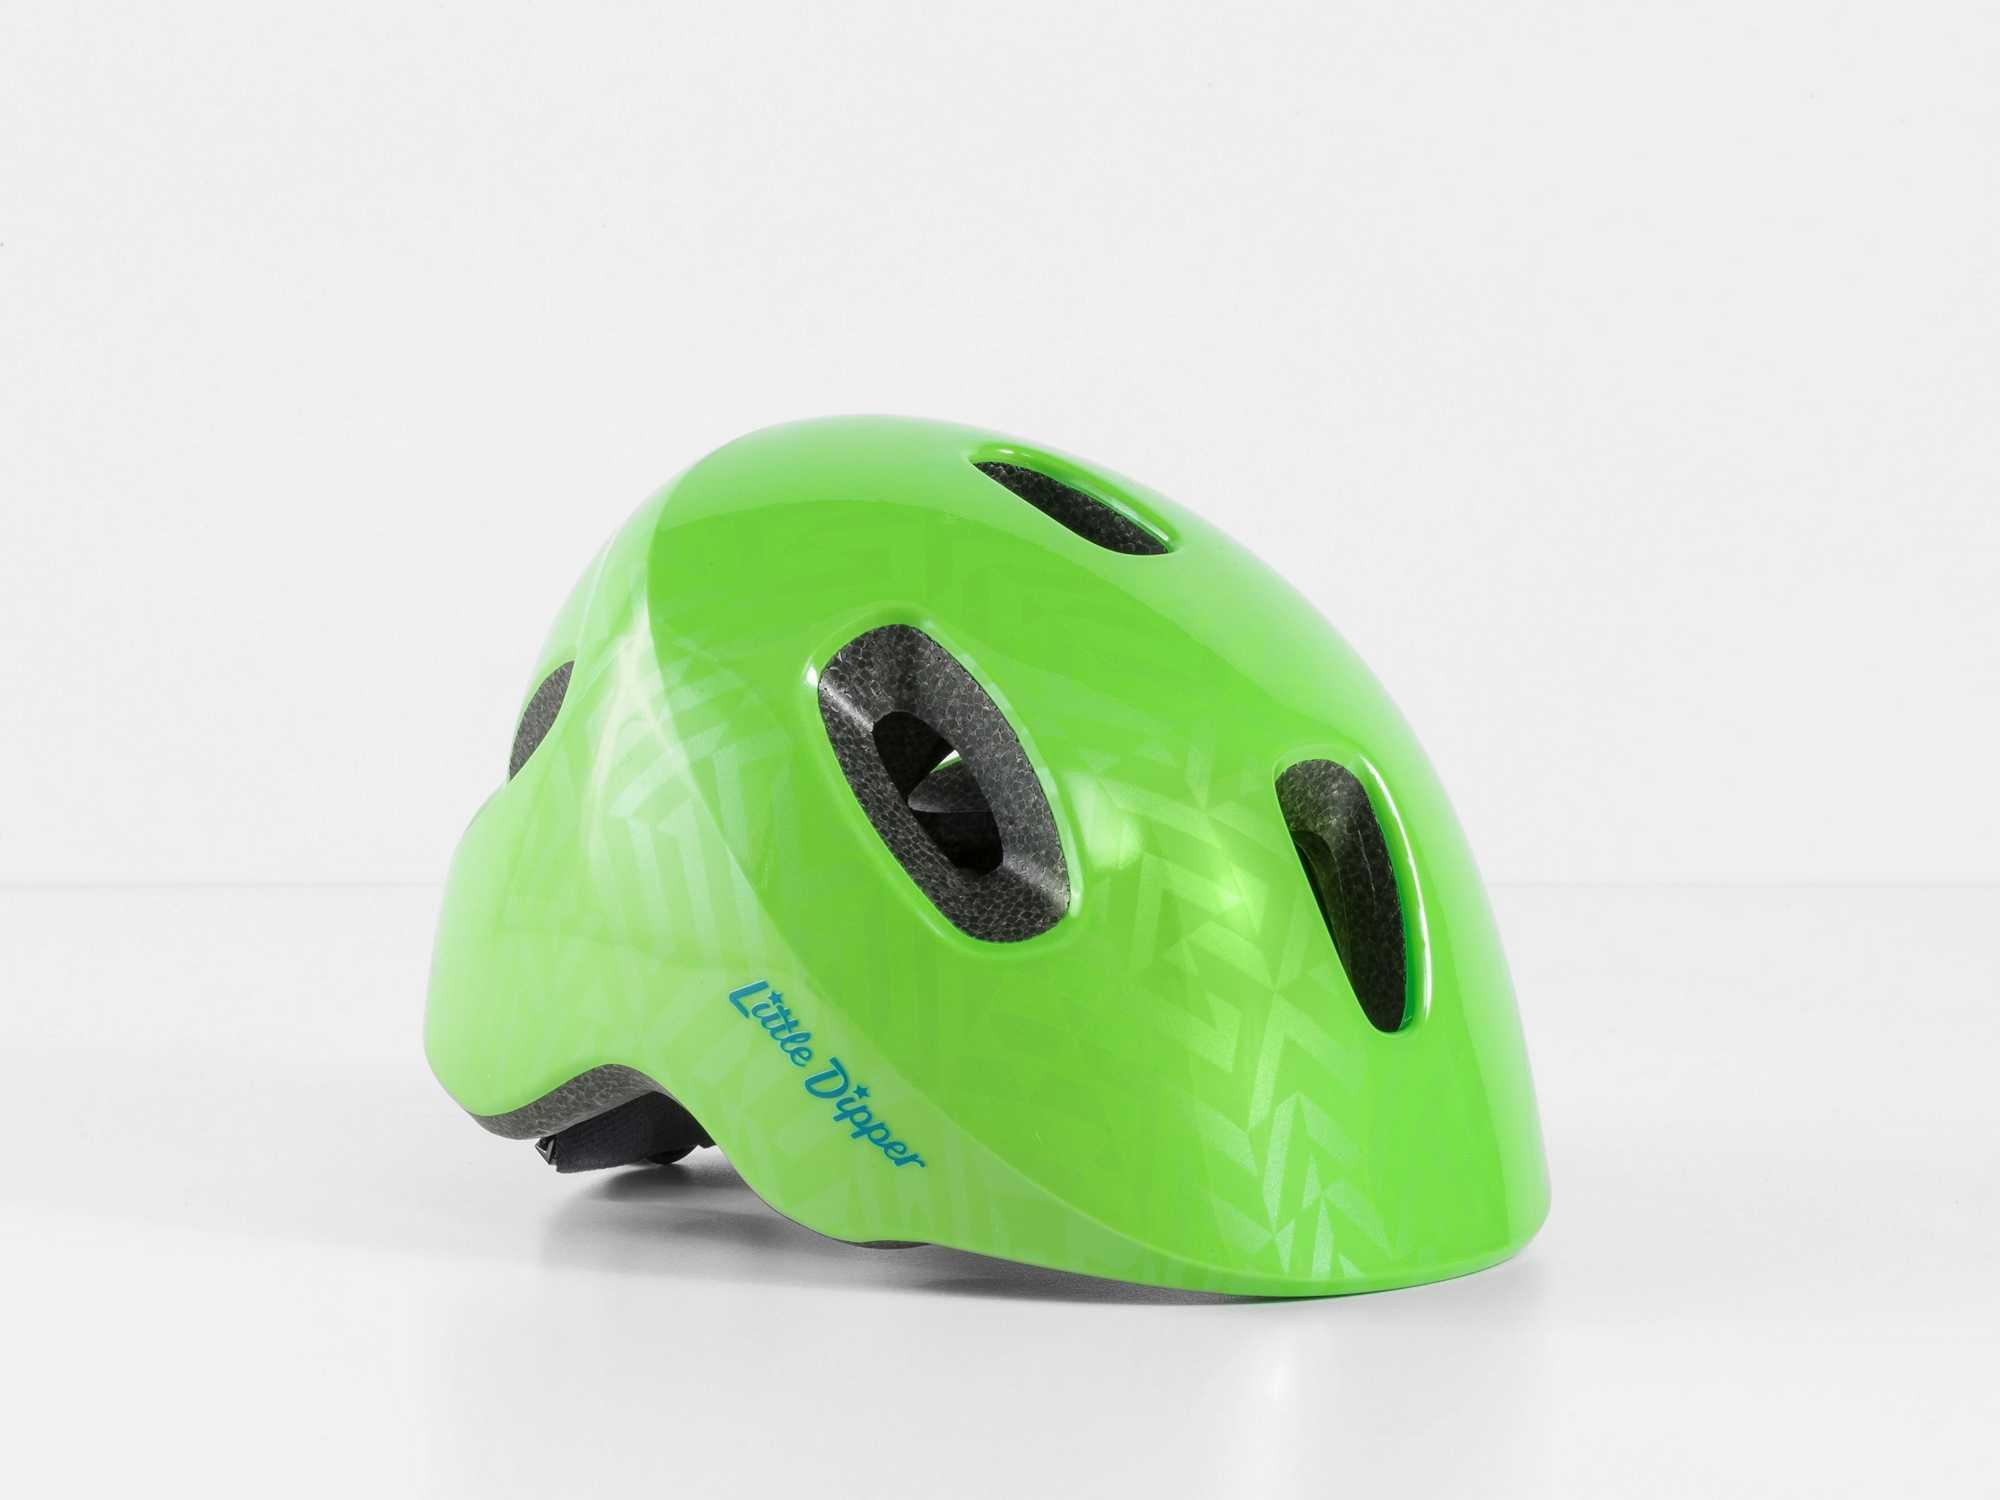 Hjälm Bontrager Little Dipper grön | Helmets